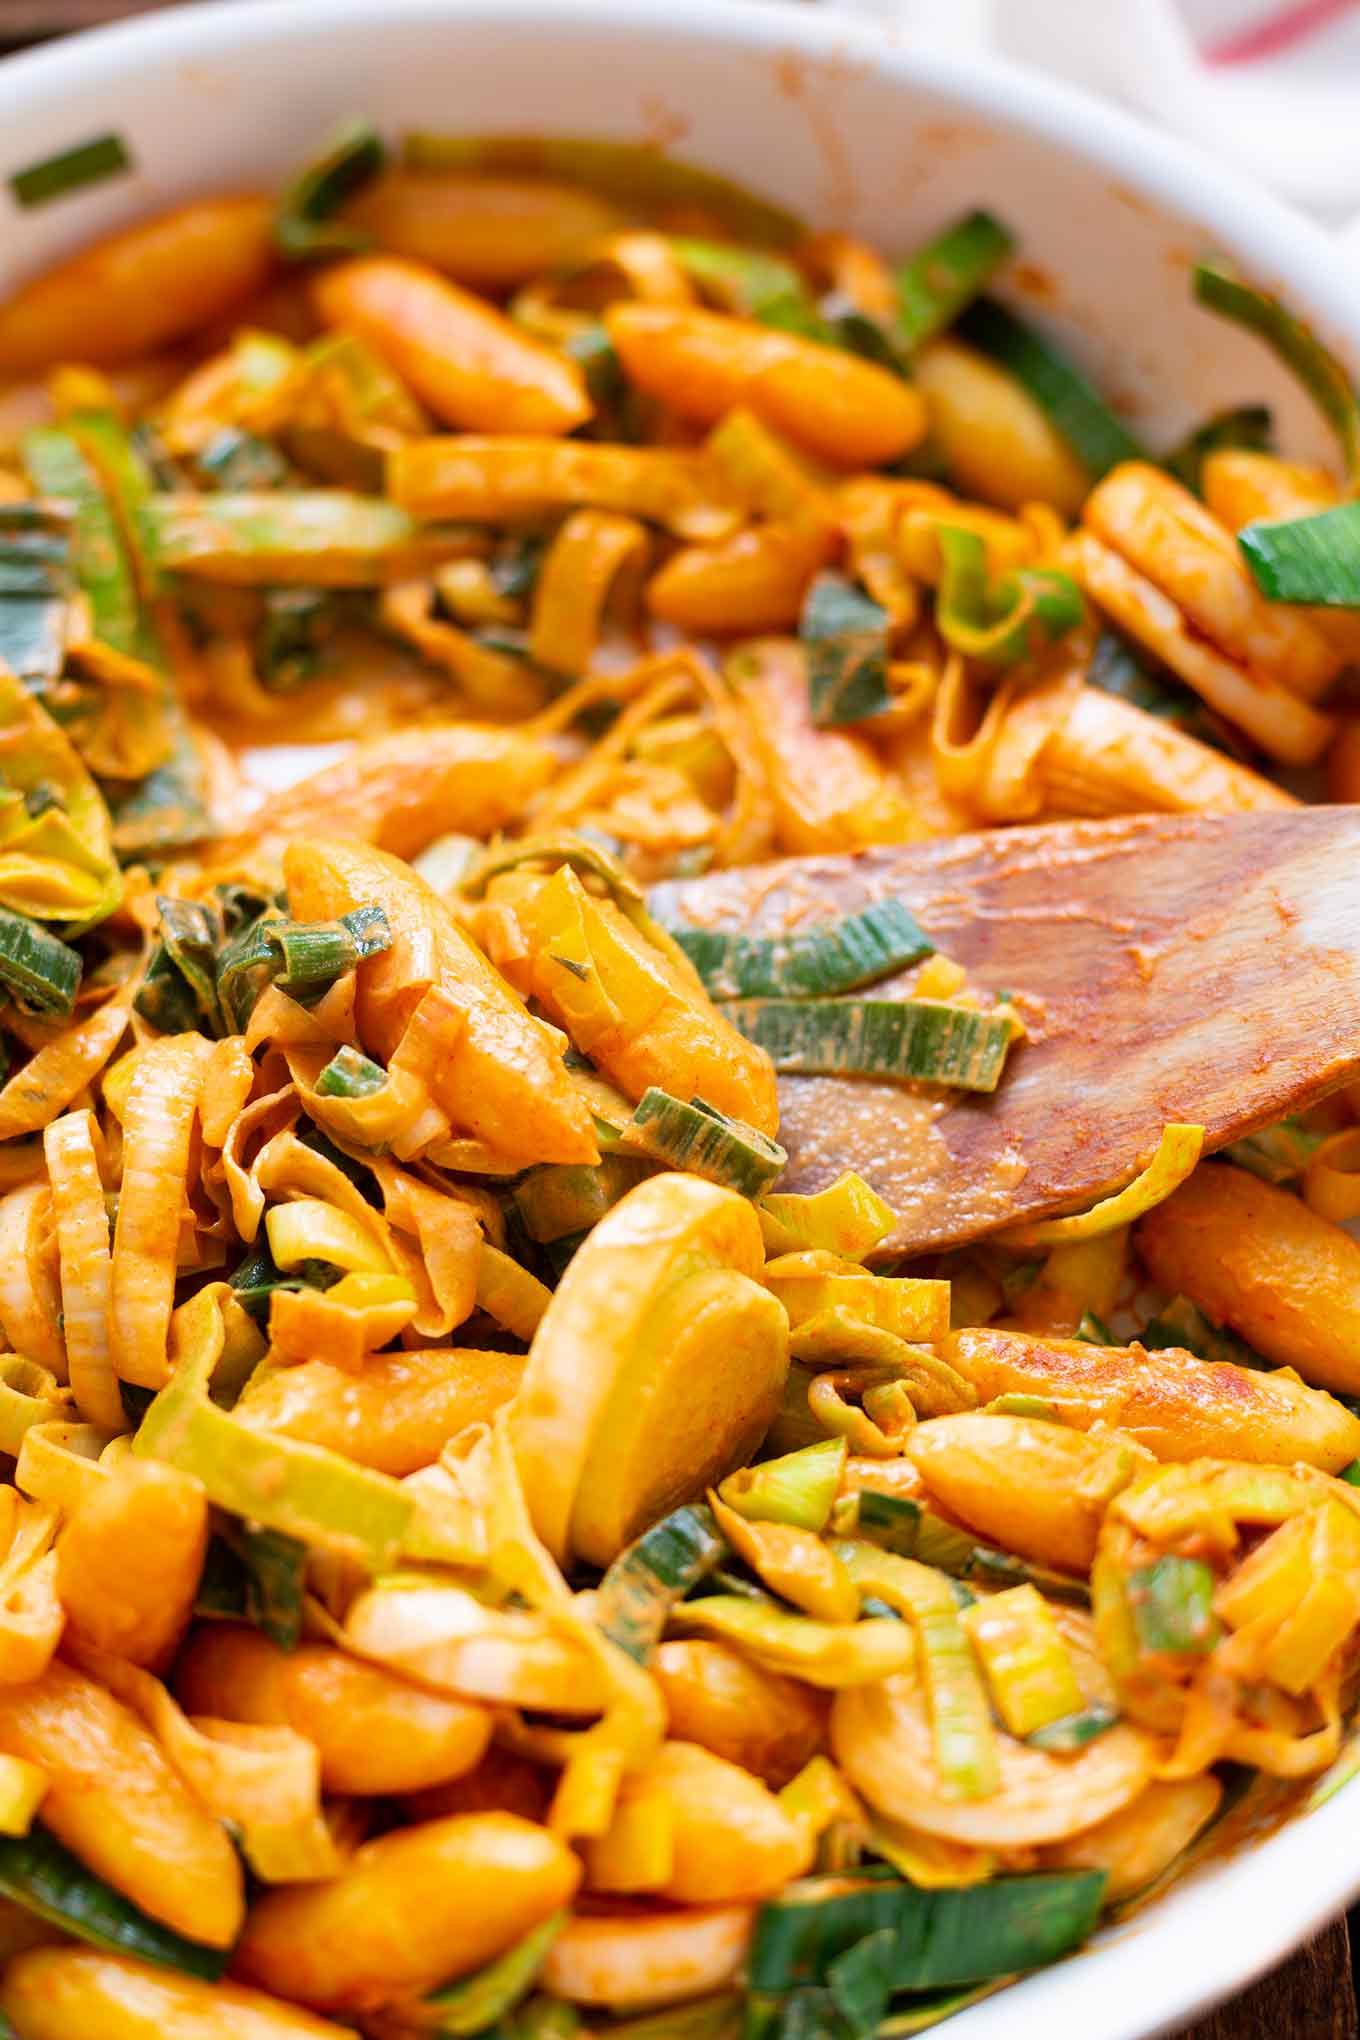 Lauch-Schupfnudel-Pfanne - Kochkarussell Foodblog